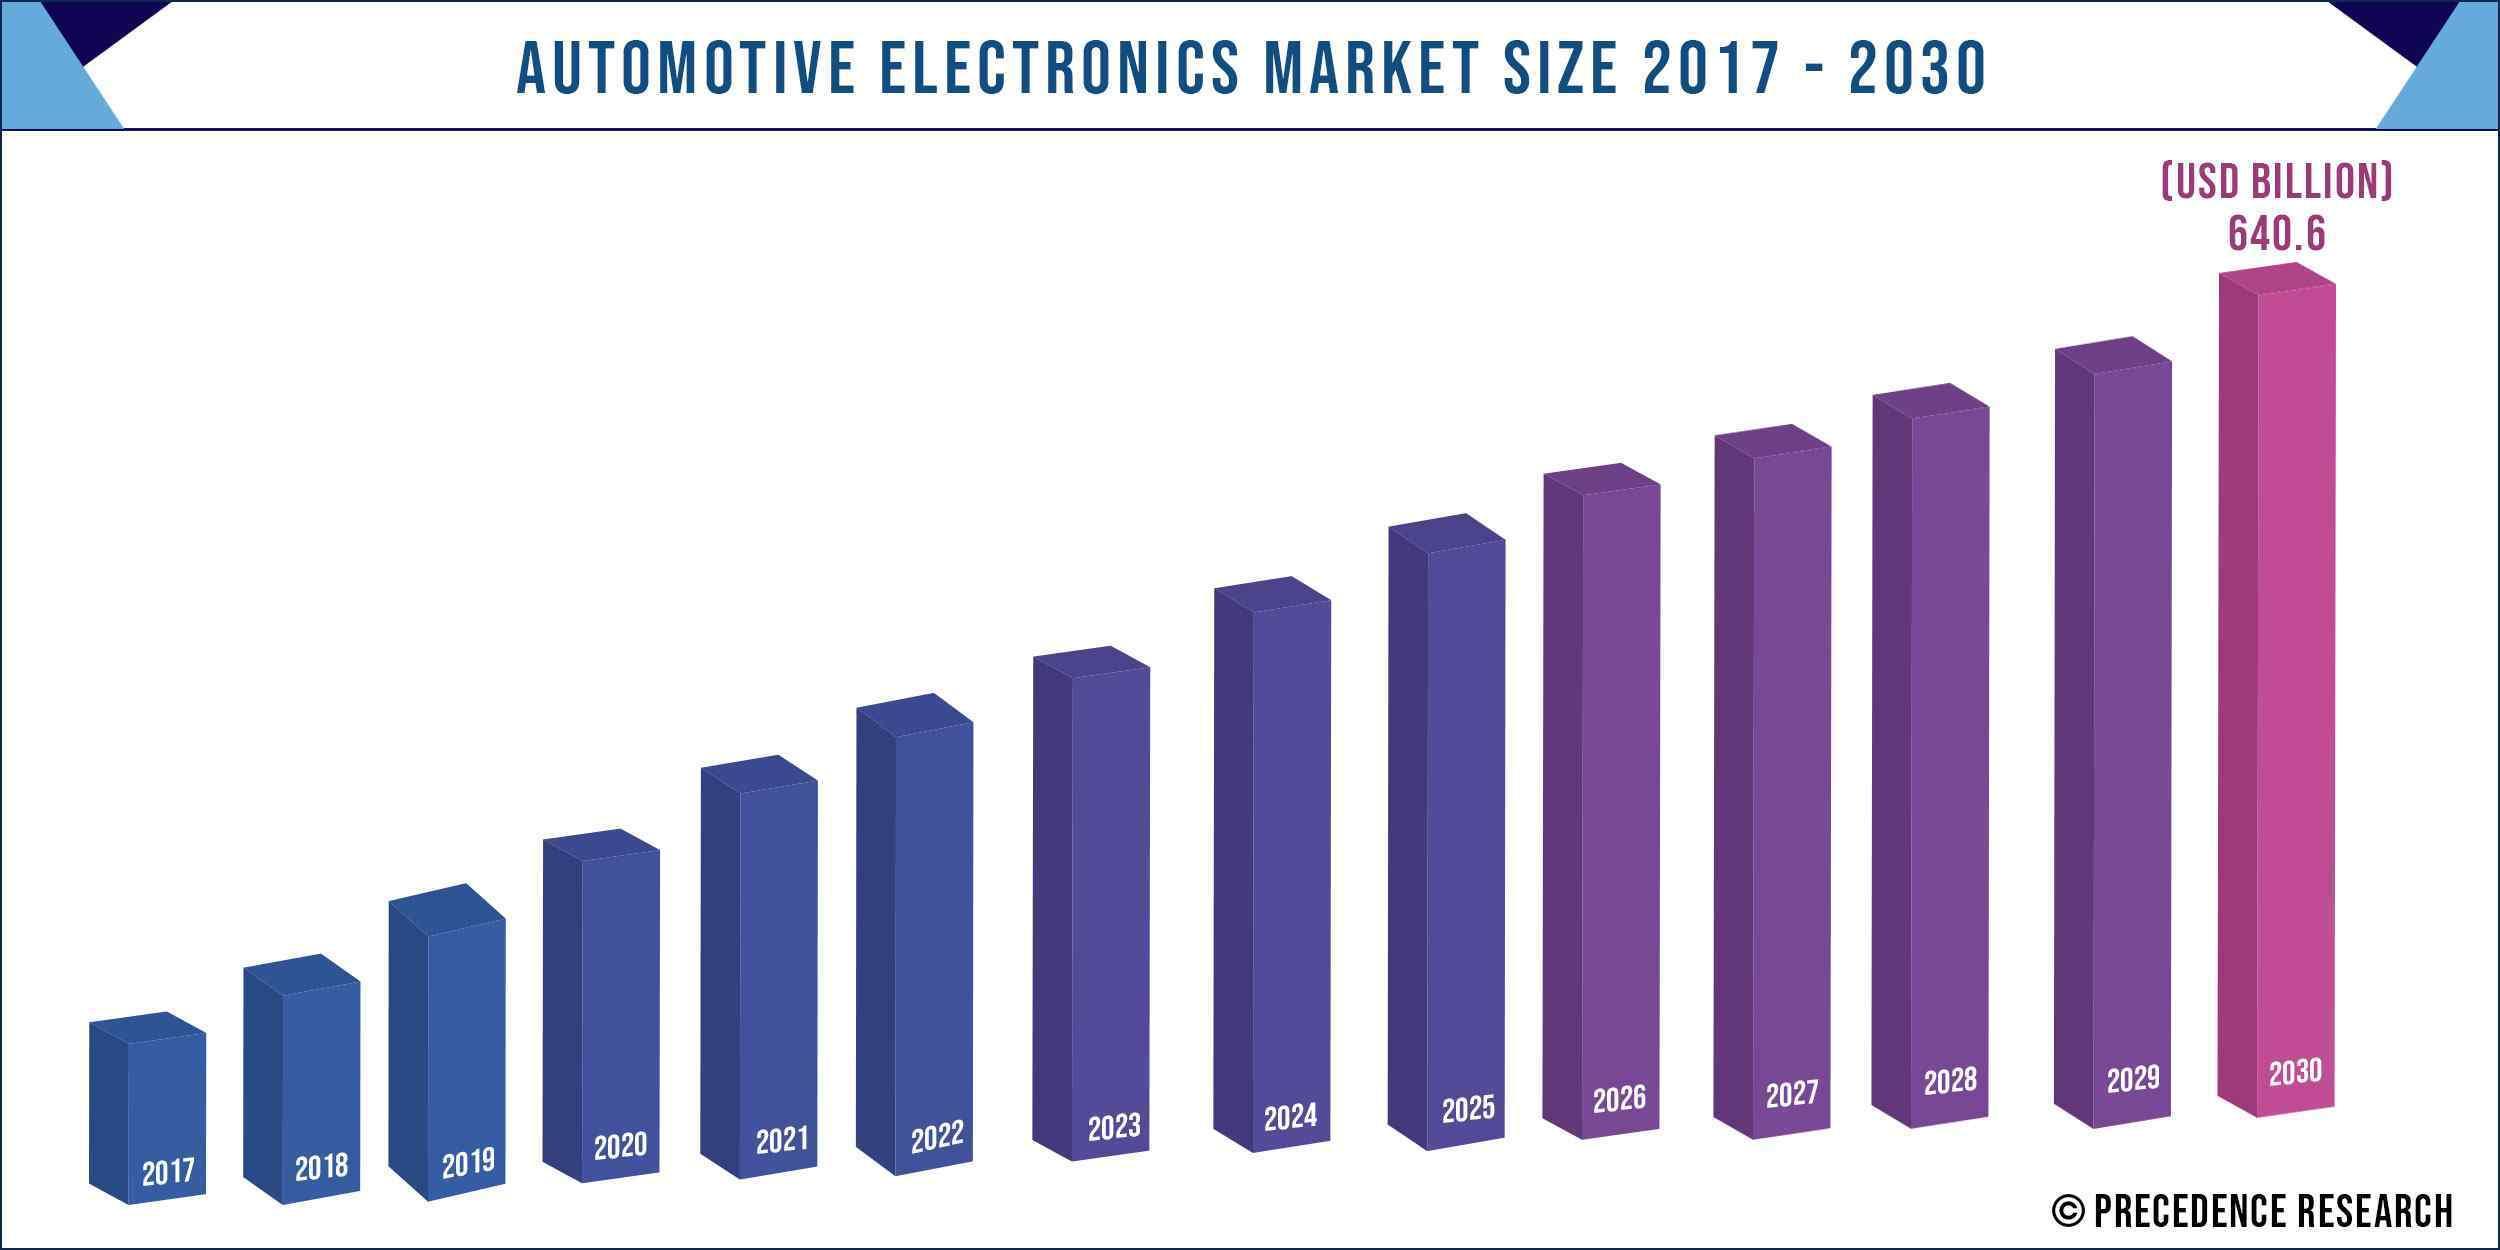 Automotive Electronics Market Size 2017-2030